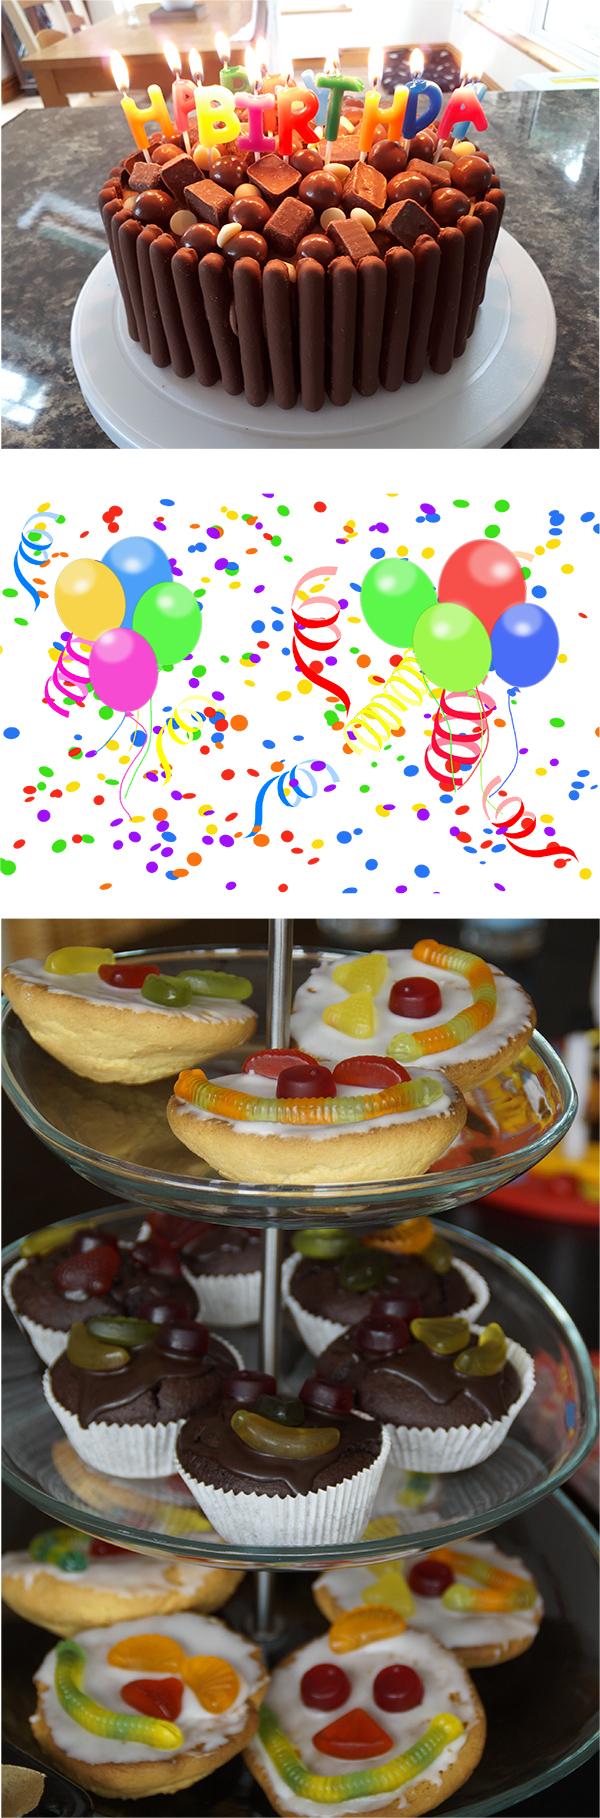 Cake decorating and Playdates